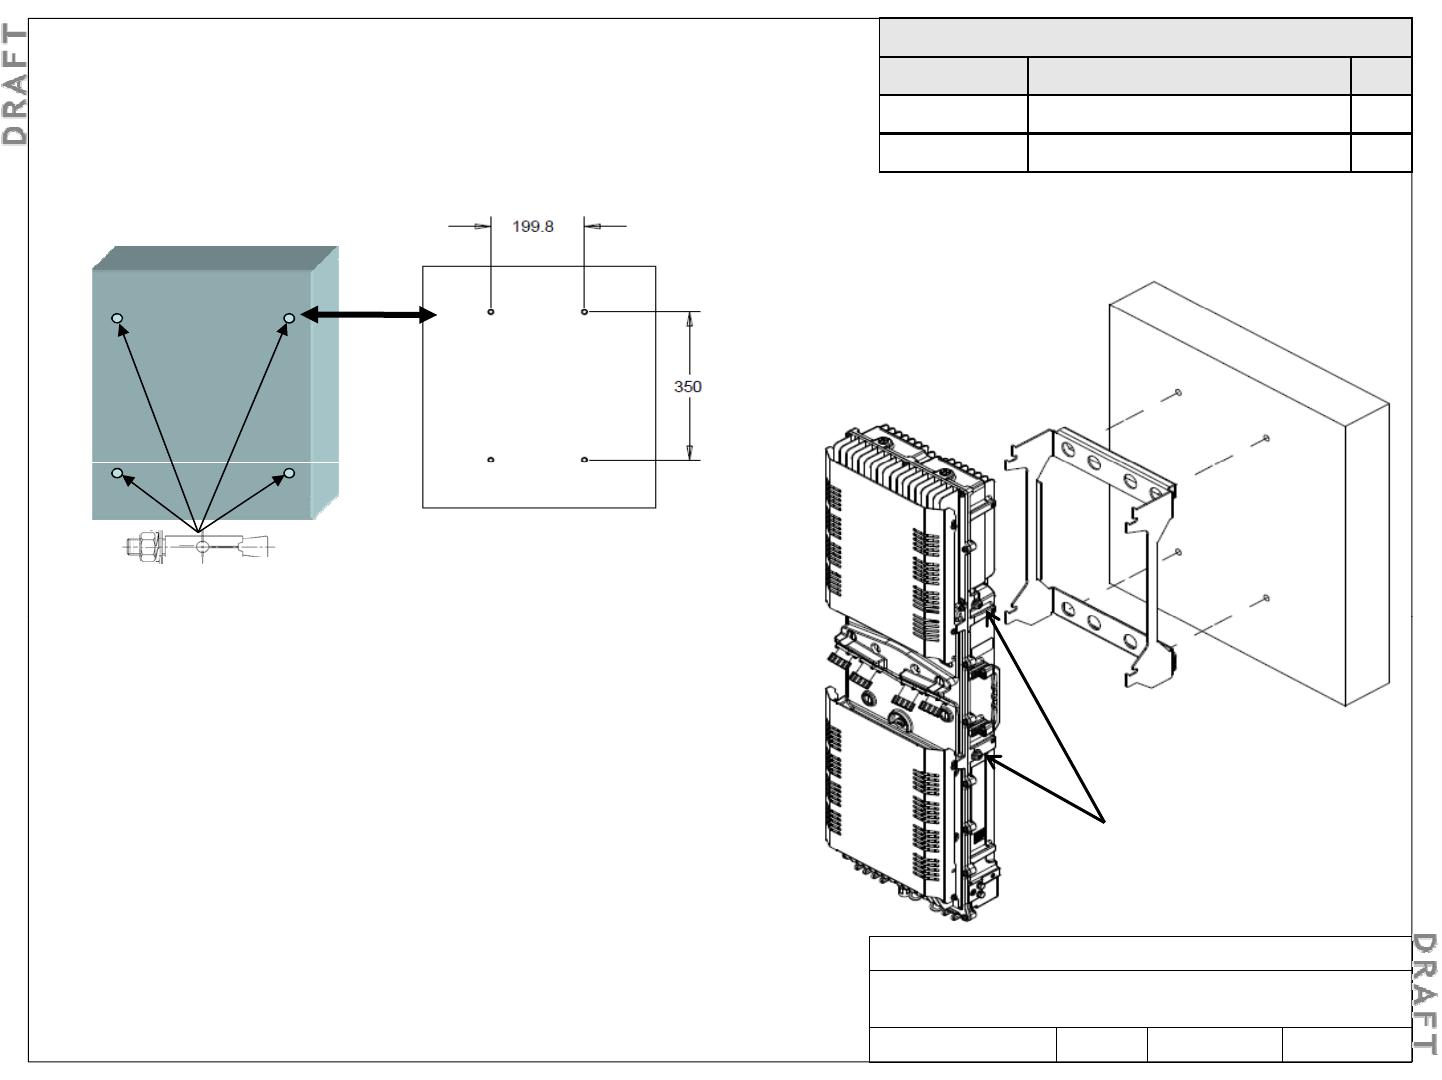 Kmw 3jr52709a Aws Rrh User Manual Test Procedure